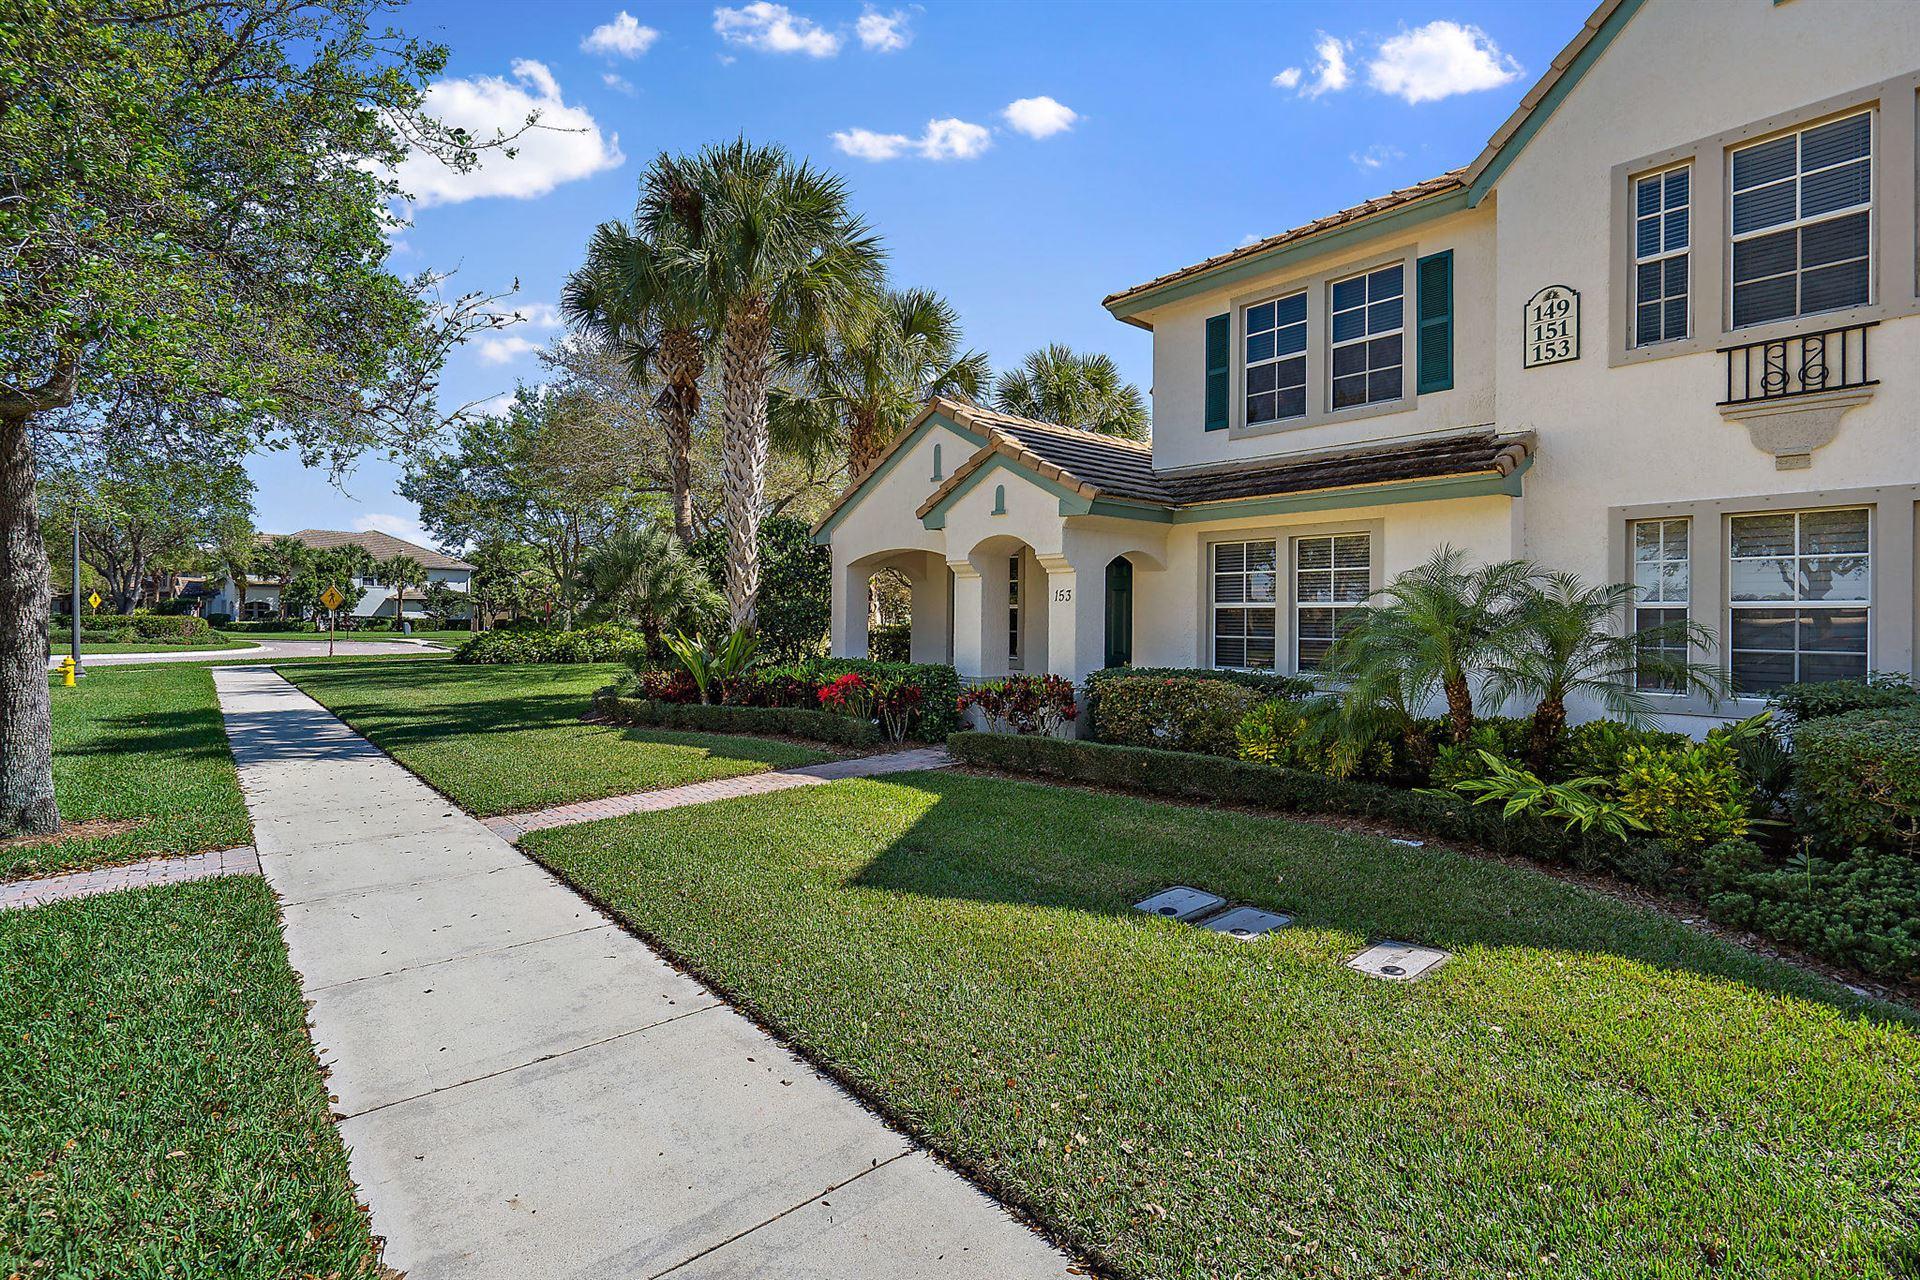 Photo of 153 Evergrene Parkway, Palm Beach Gardens, FL 33410 (MLS # RX-10713444)